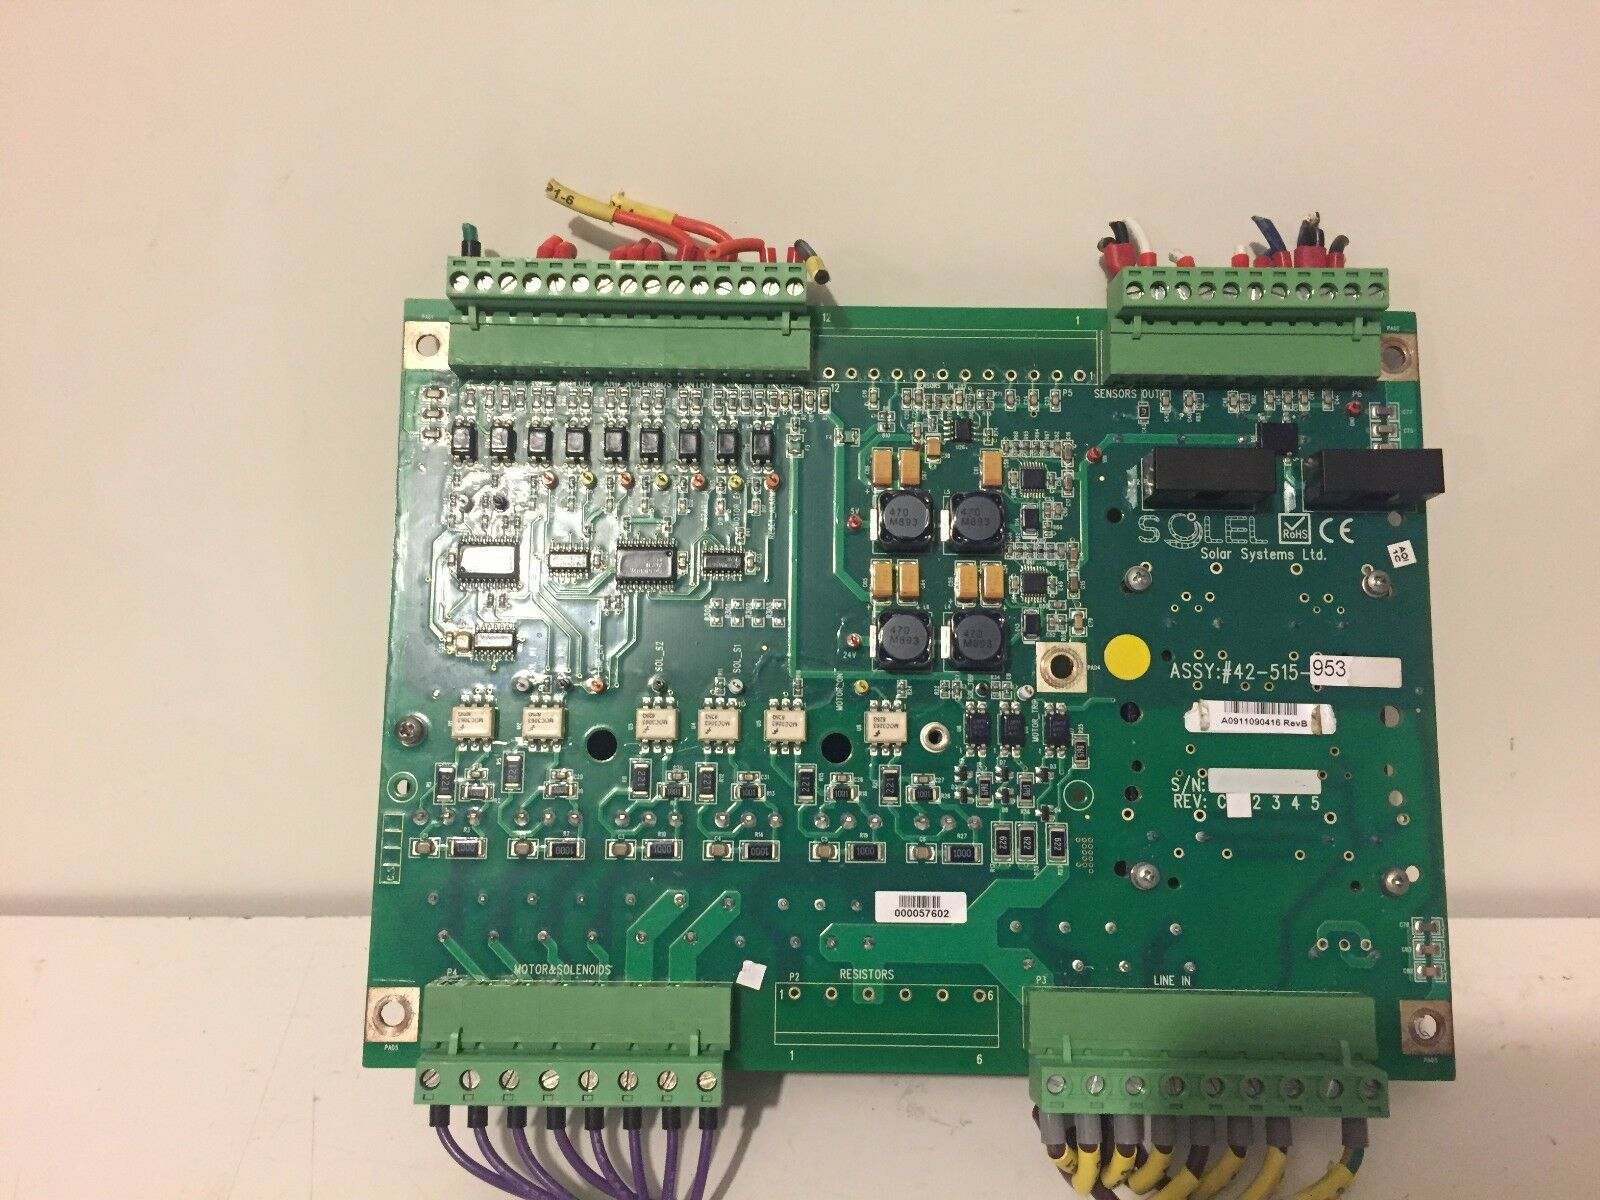 SOLAR SYSTEM SOLEL BOARD 42-515-953